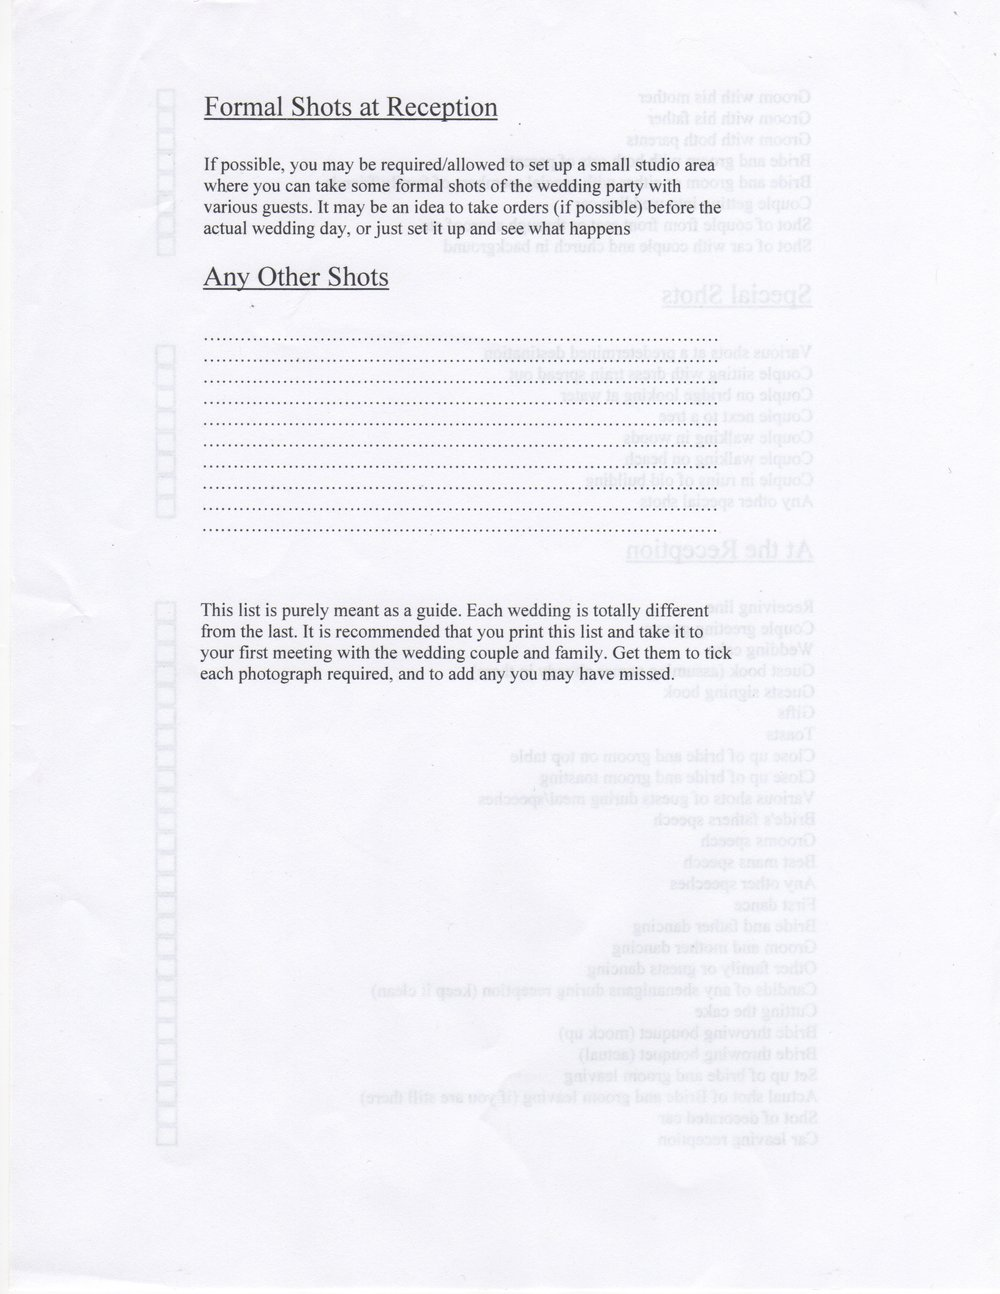 Scan 6.jpeg